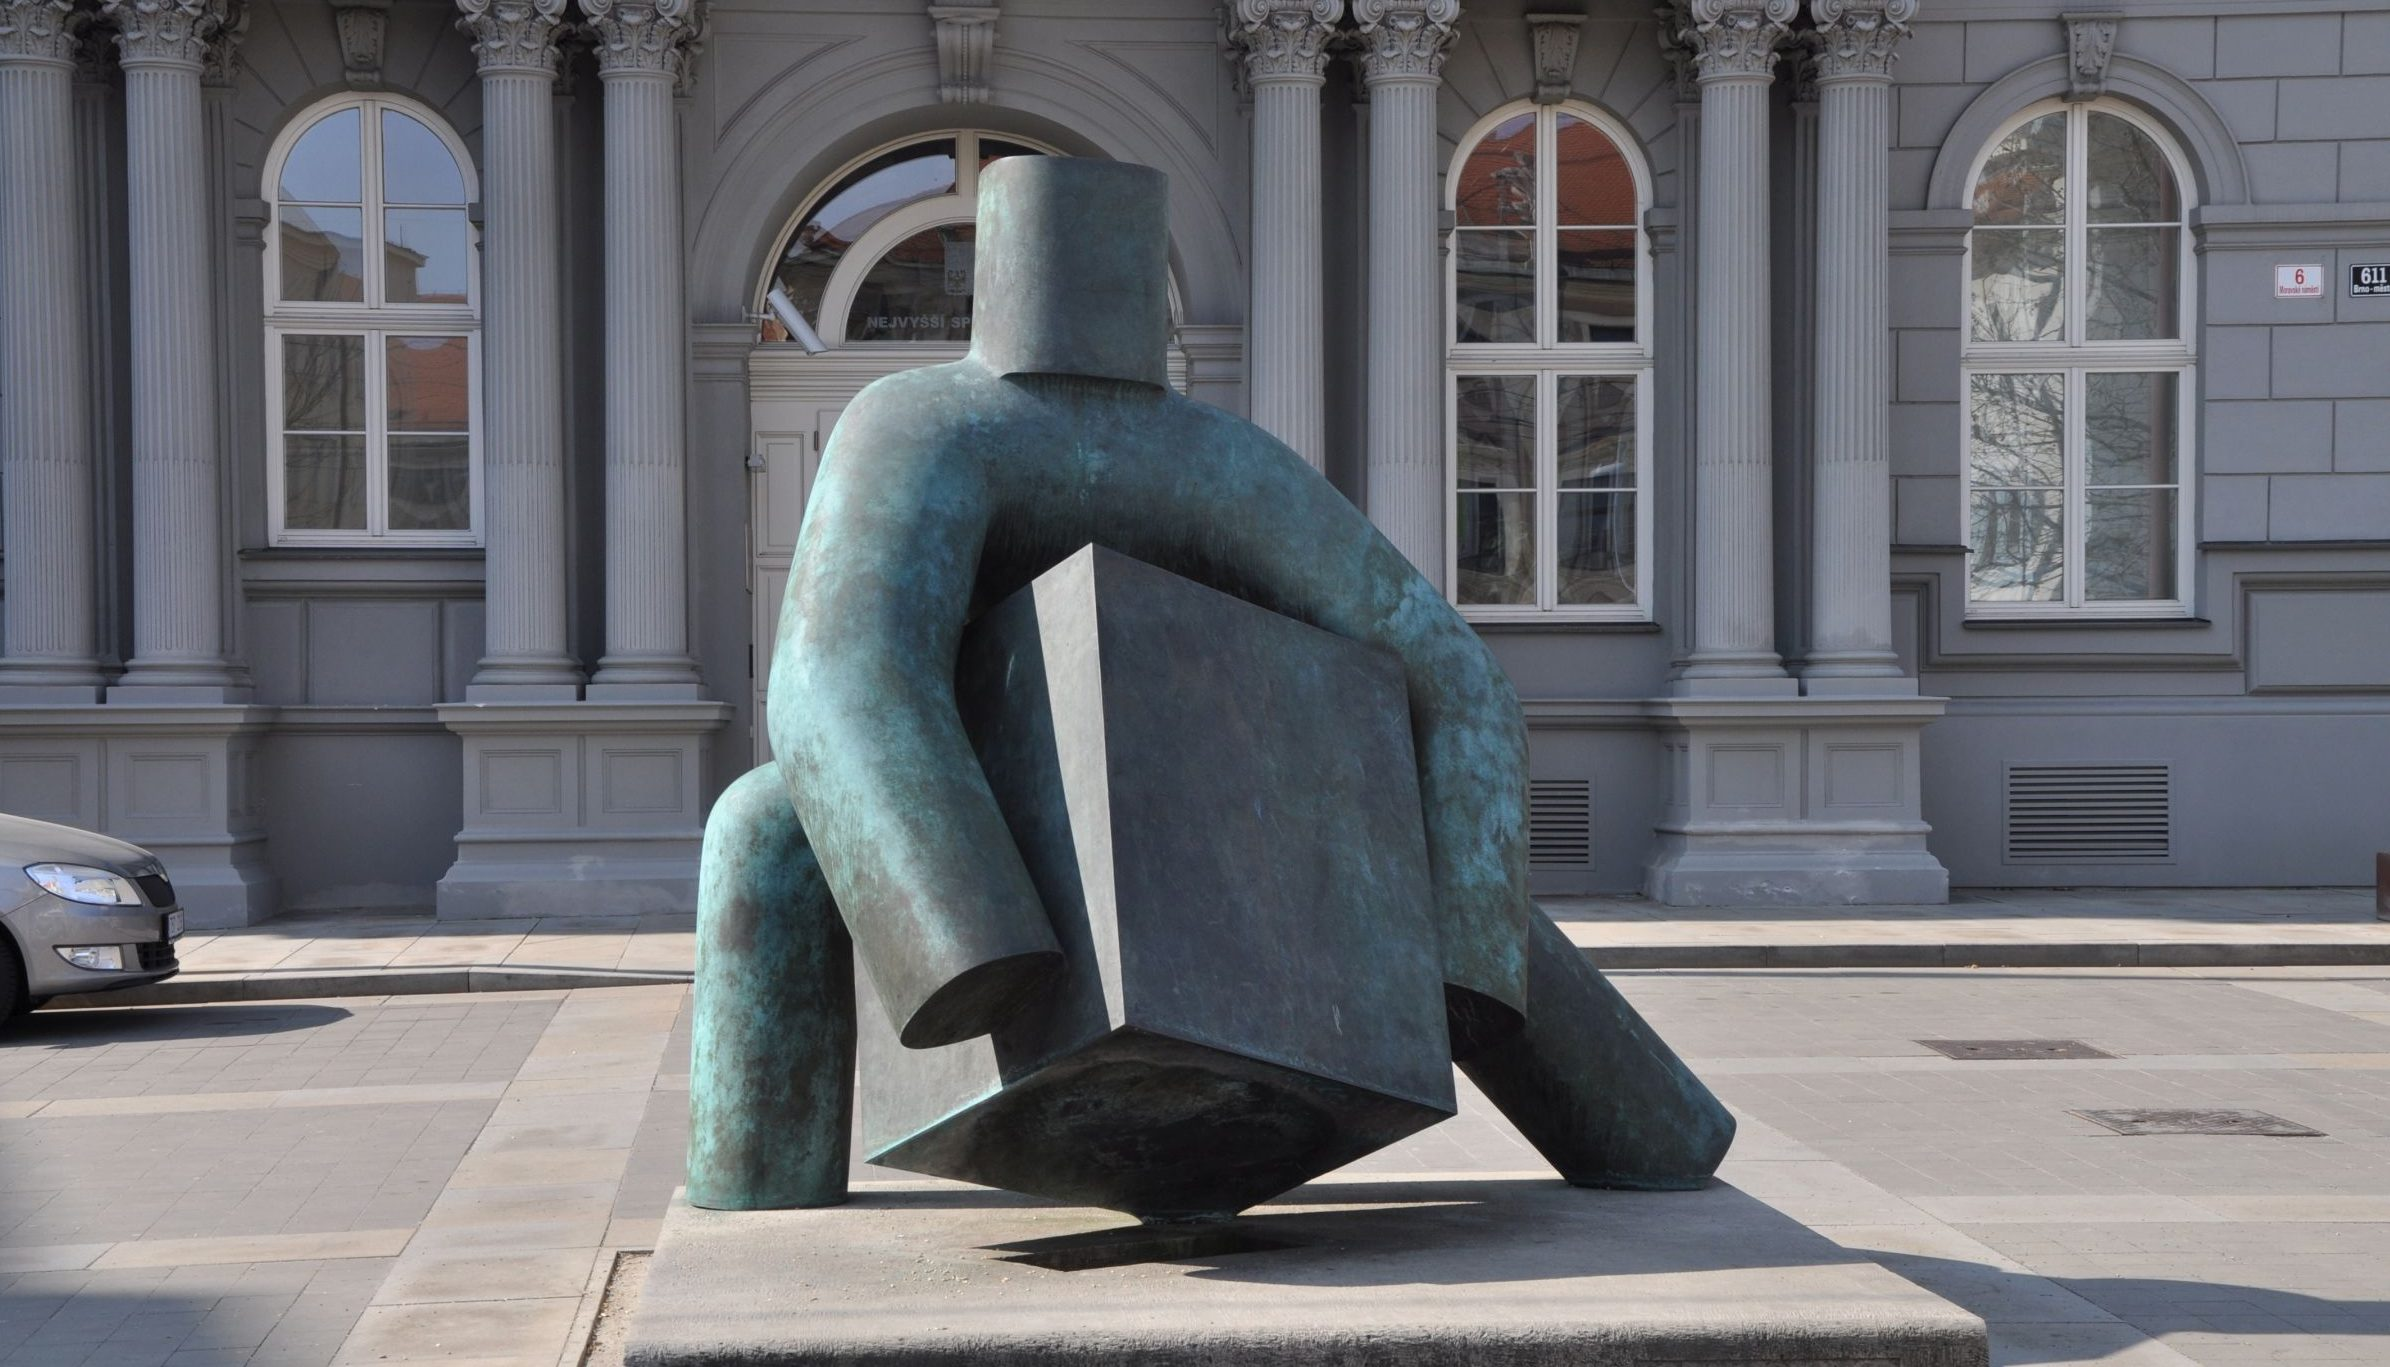 Statue: Marius Kotrba: Justice (Spravedlnost) in Brno